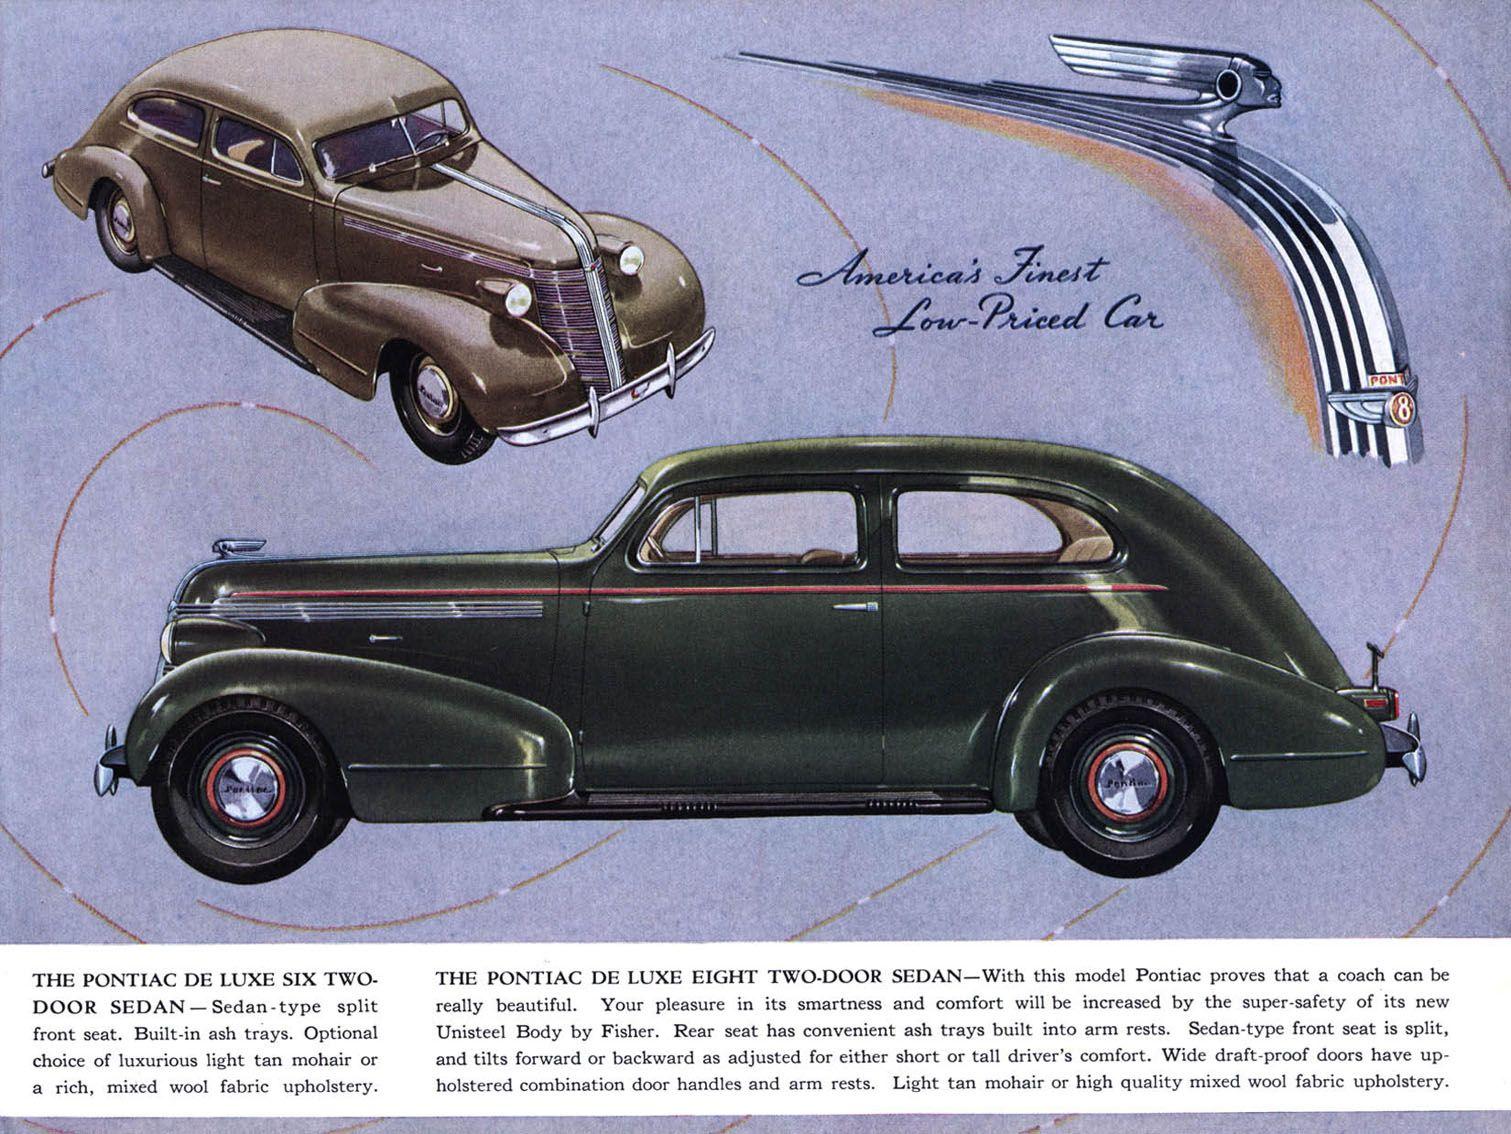 1937 Pontiac 2 door sedan | Pontiac ..car brochures | Pinterest ...